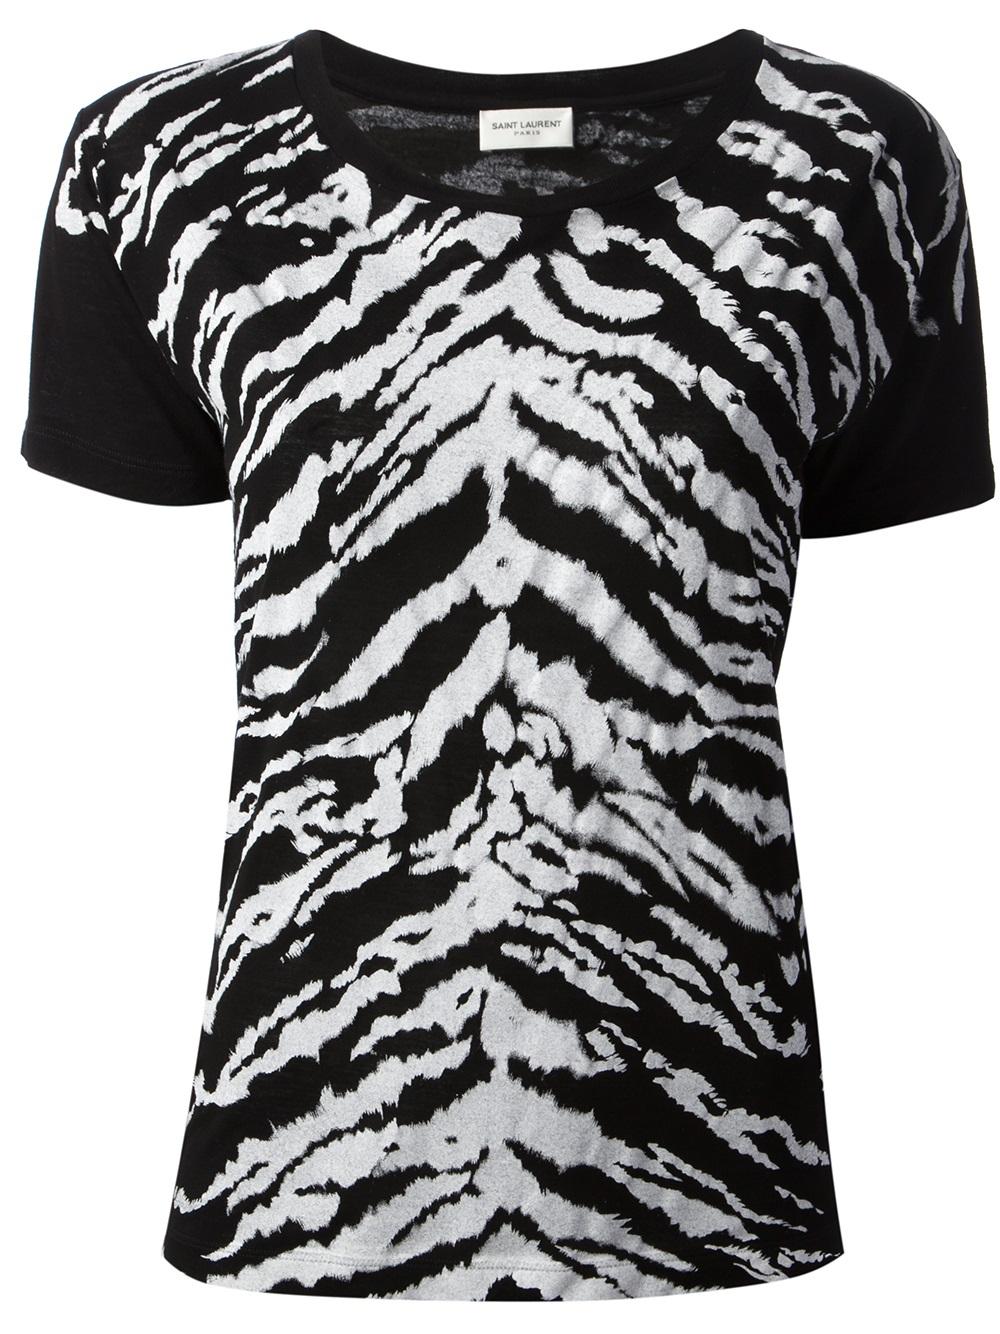 lyst saint laurent zebra print tshirt in black. Black Bedroom Furniture Sets. Home Design Ideas